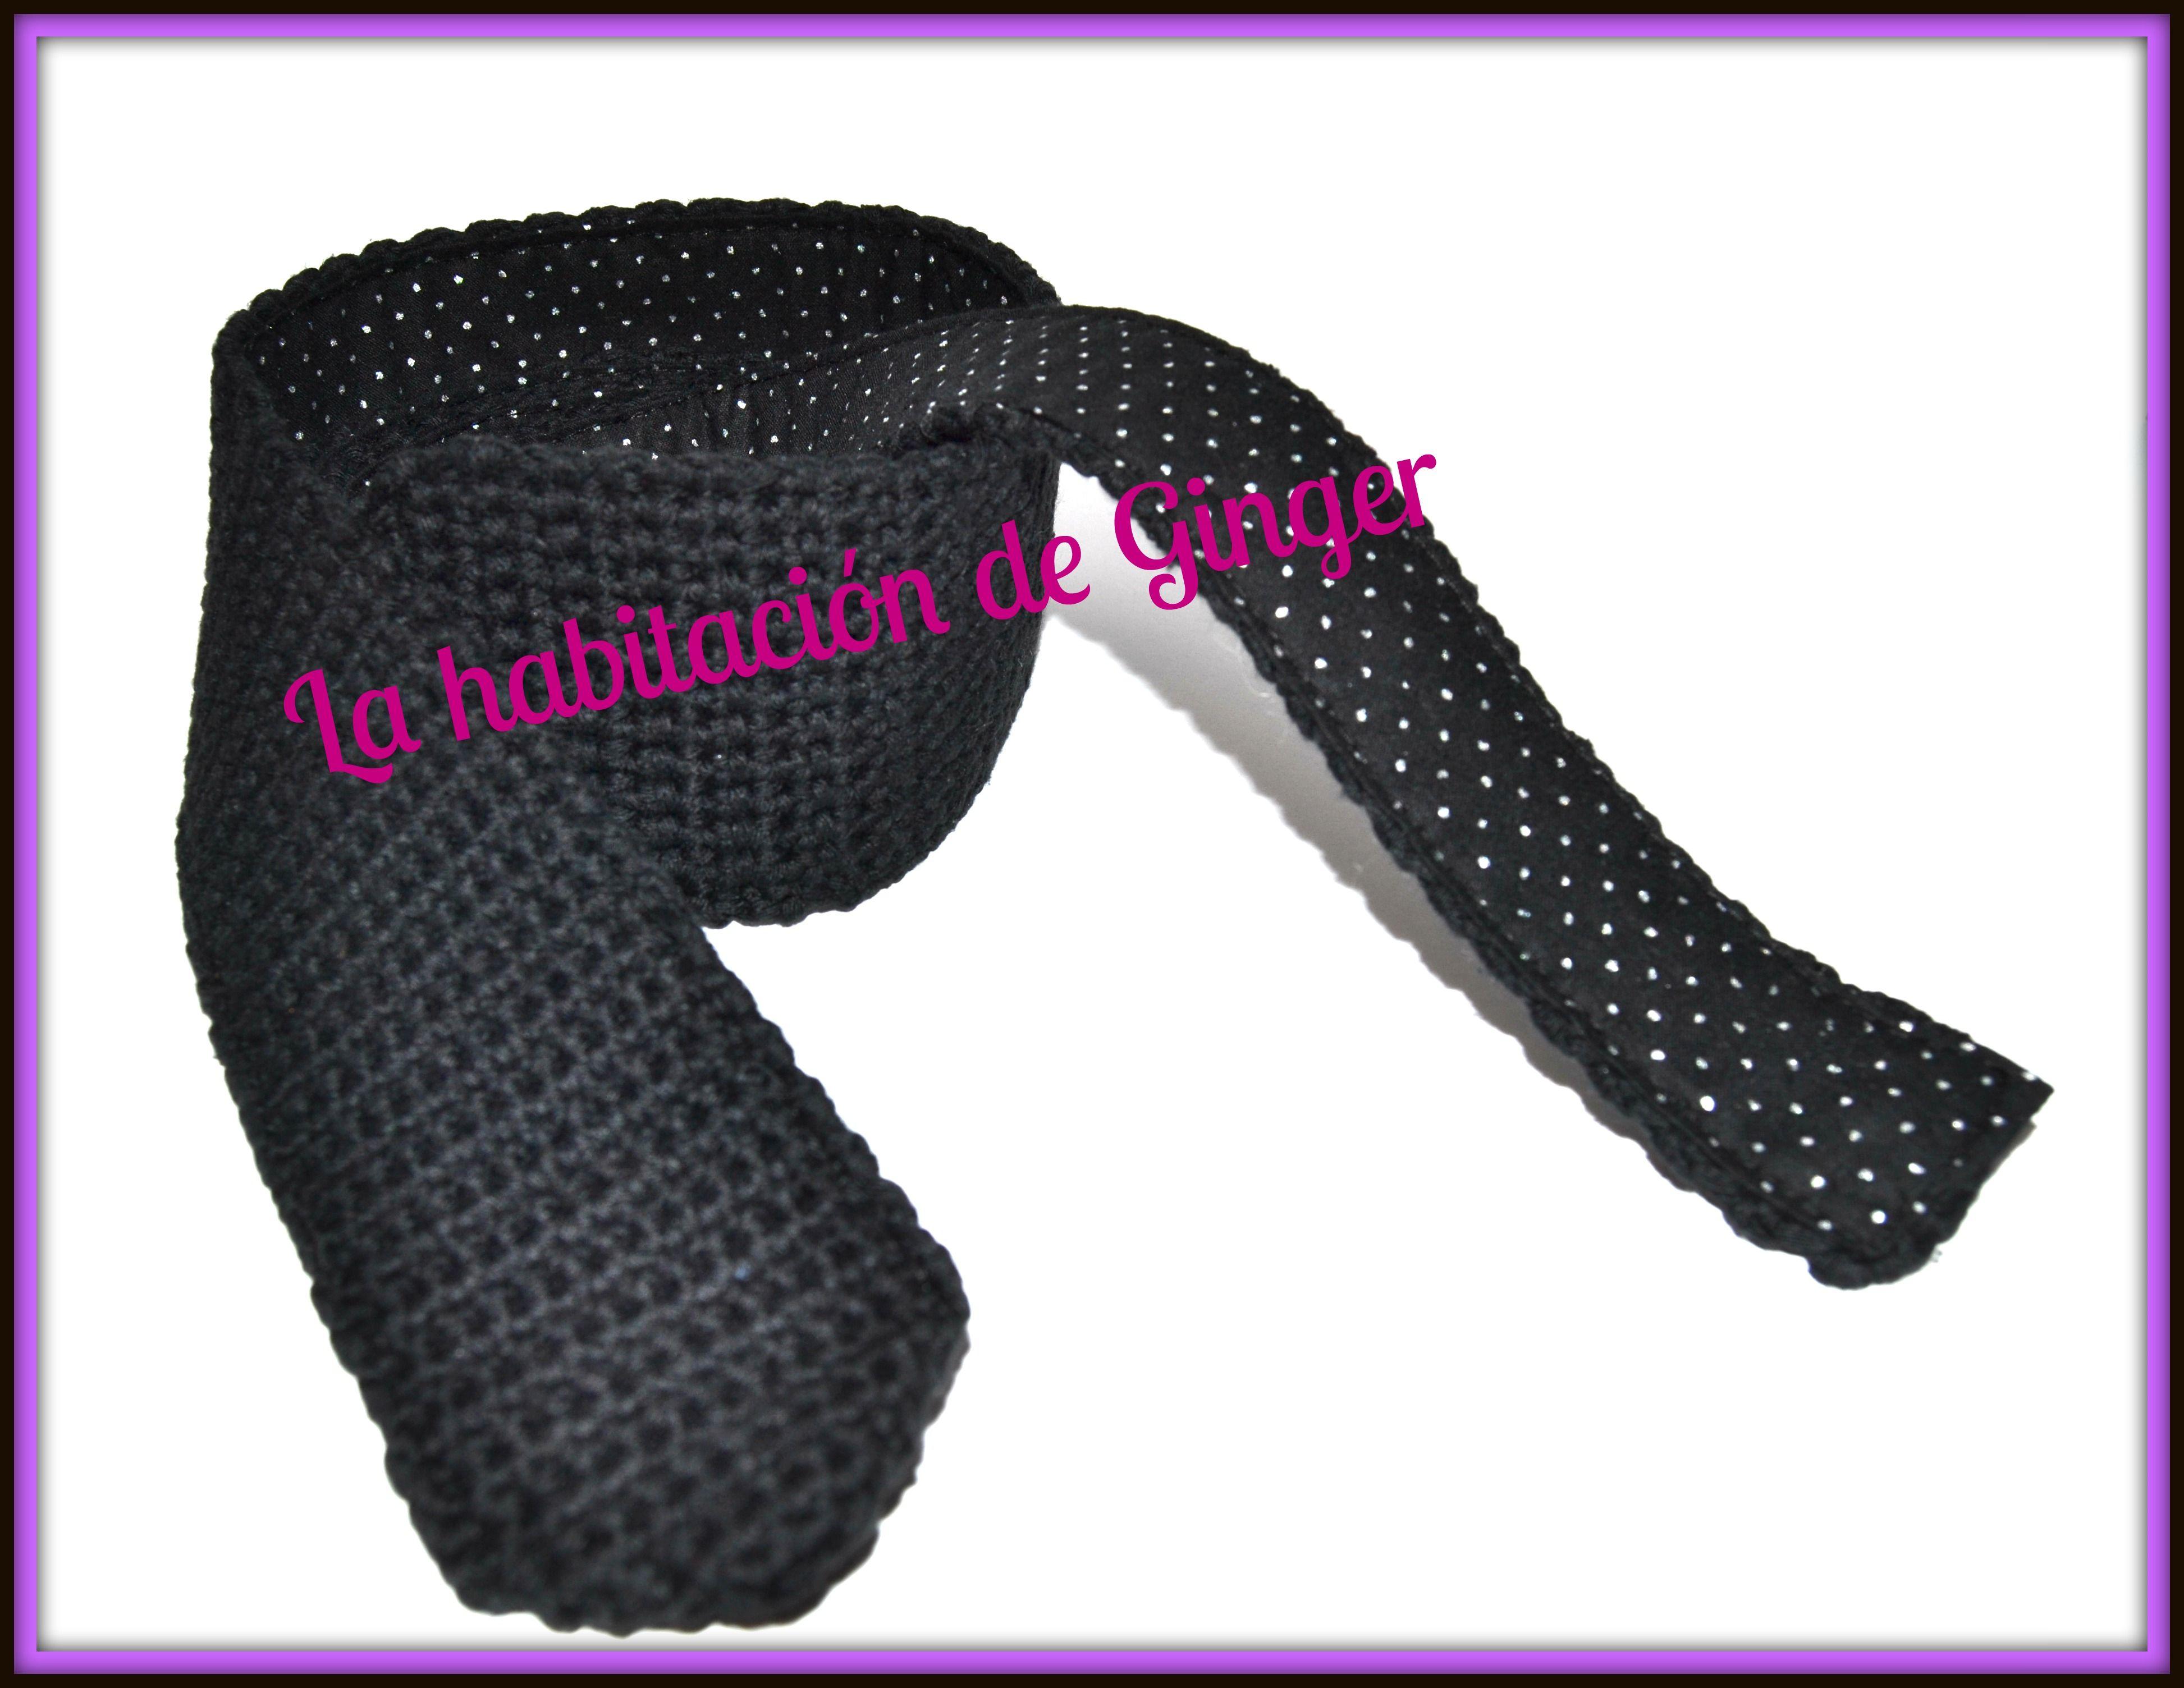 http://lahabitaciondeginger.blogspot.com.es/2014/12/elegante-y-cool.html  Corbata de ganchillo